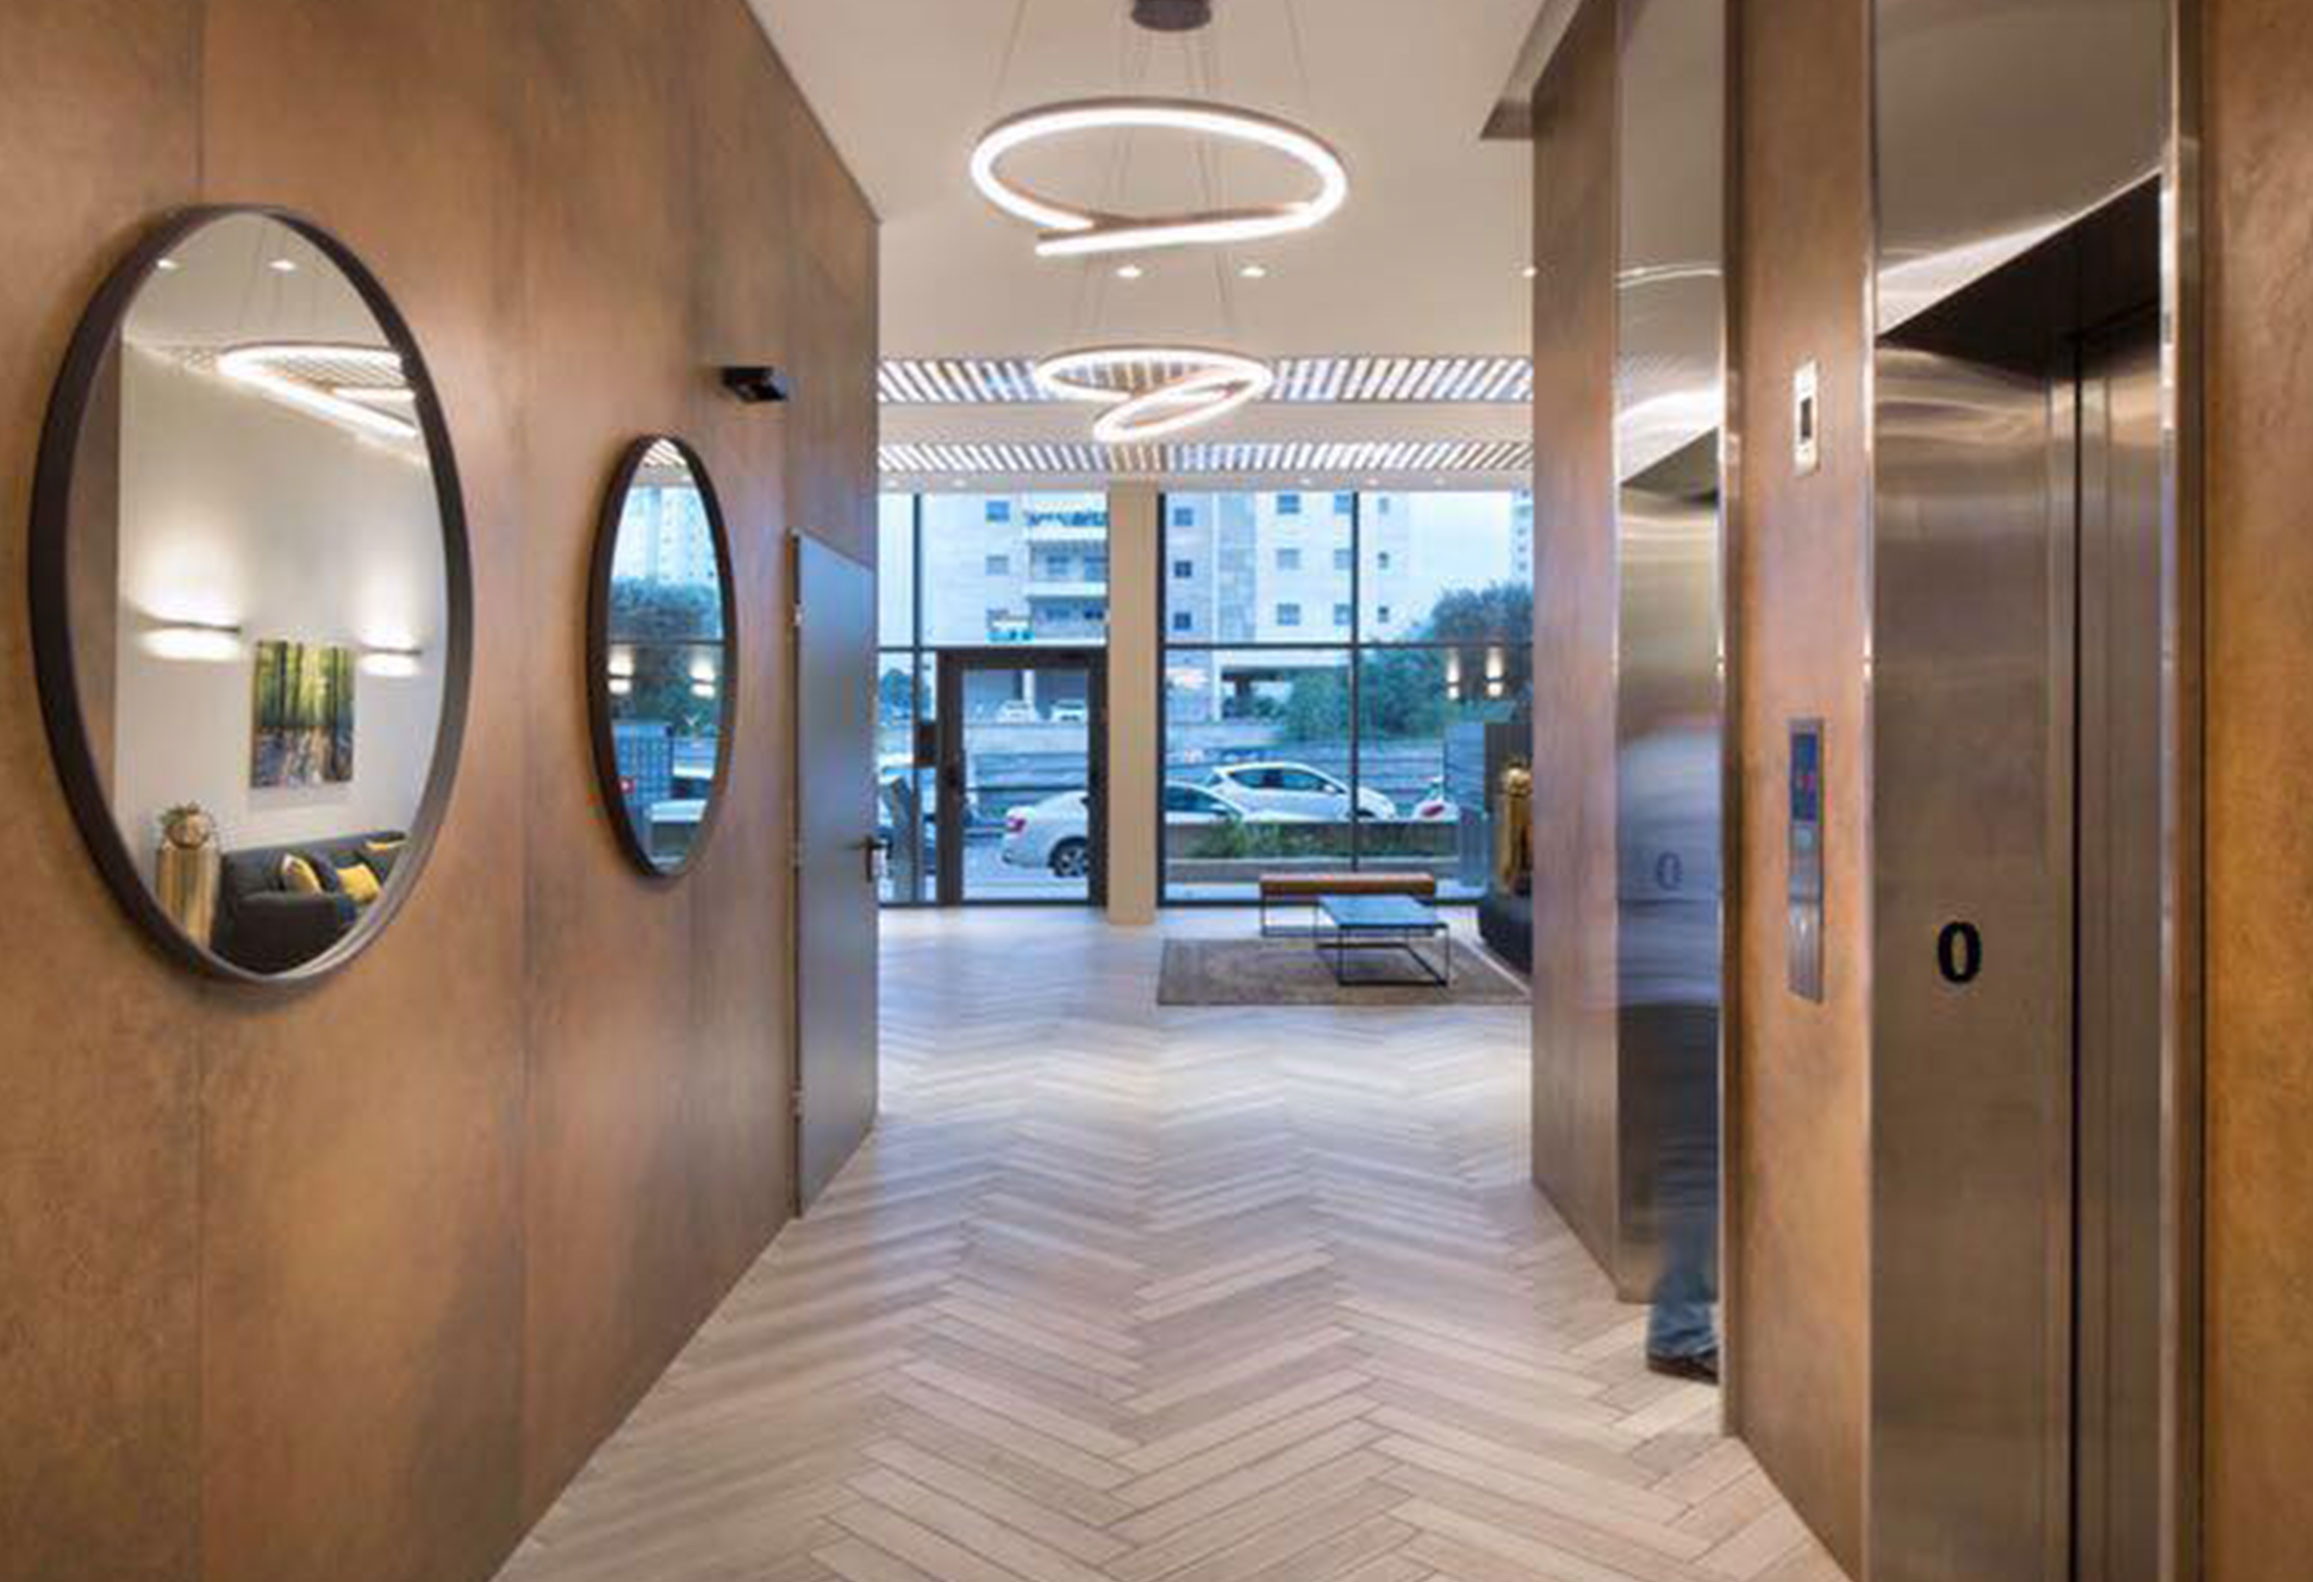 Nurit-Leshem_marom-rishon-le-zion12.11.17-floor-lobby_2.jpg